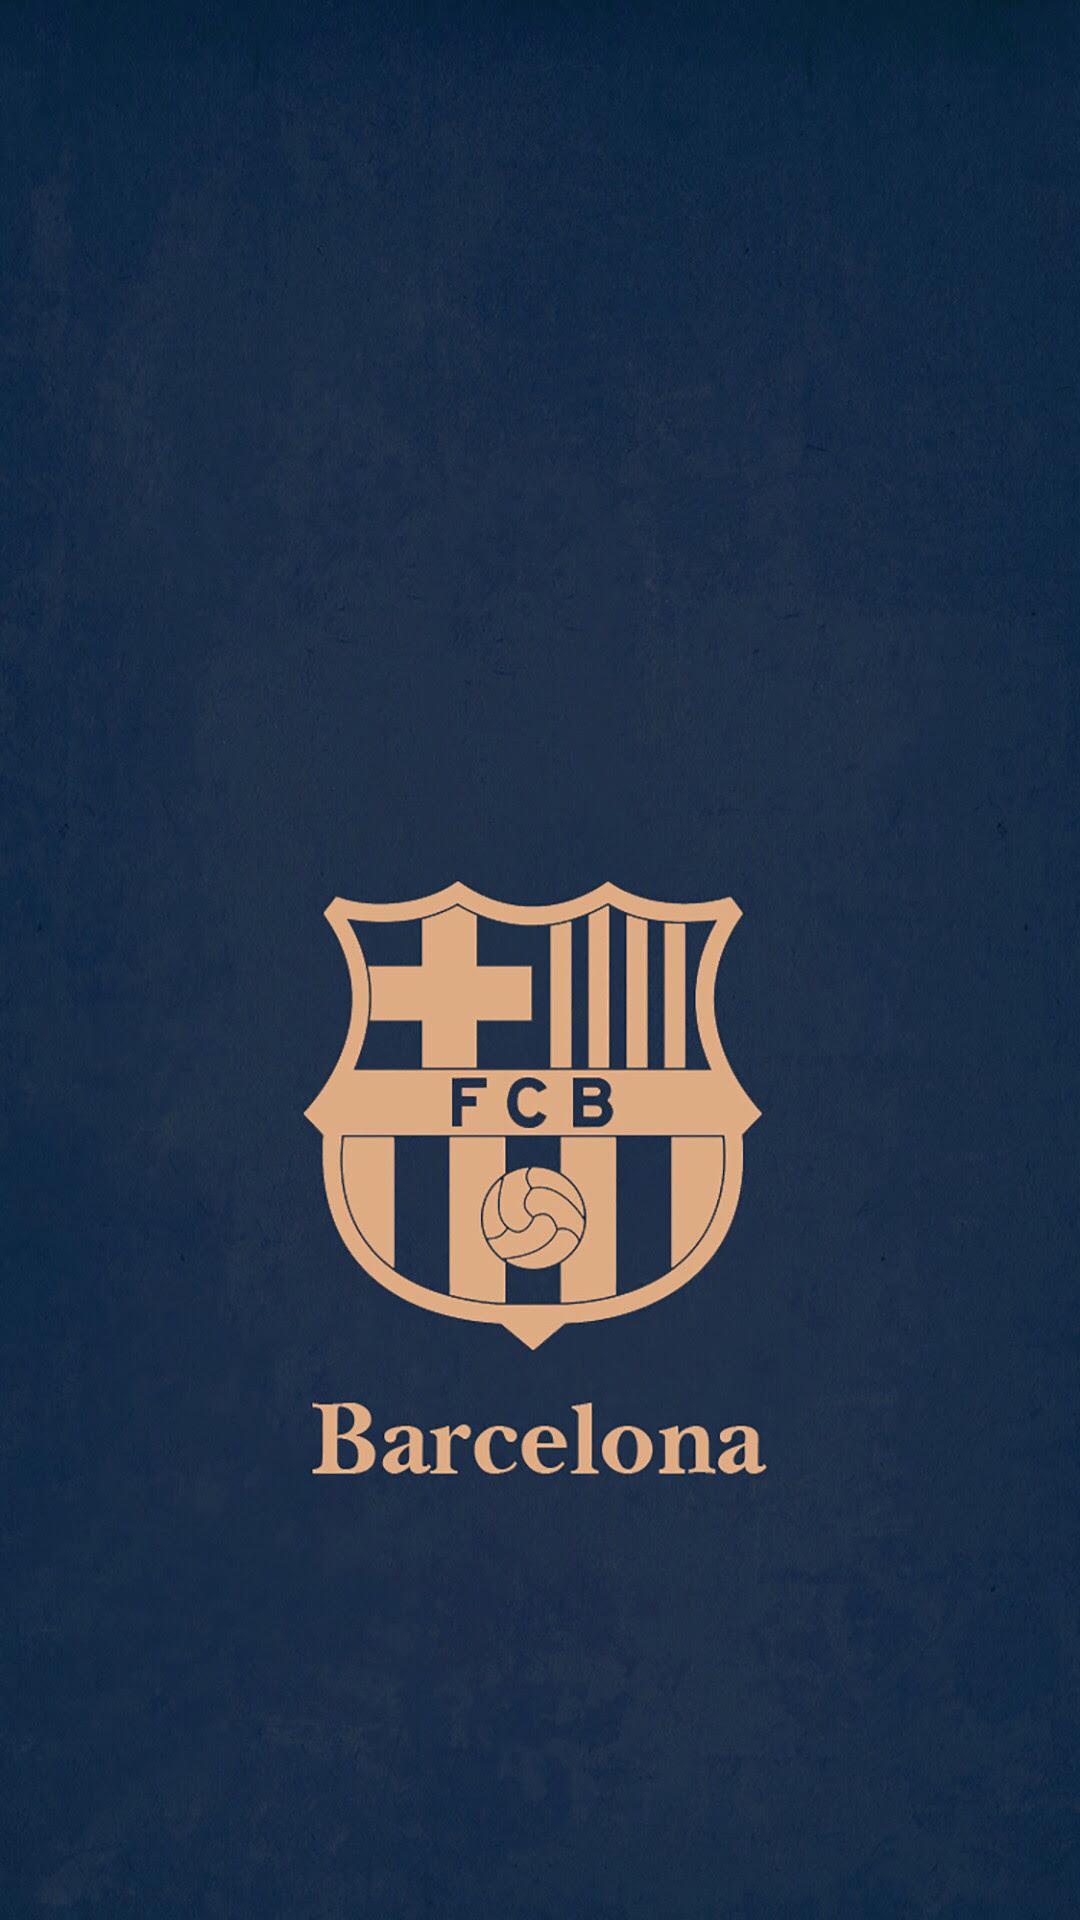 Fc Barcelona Wallpaper Hd 2018 68 Images